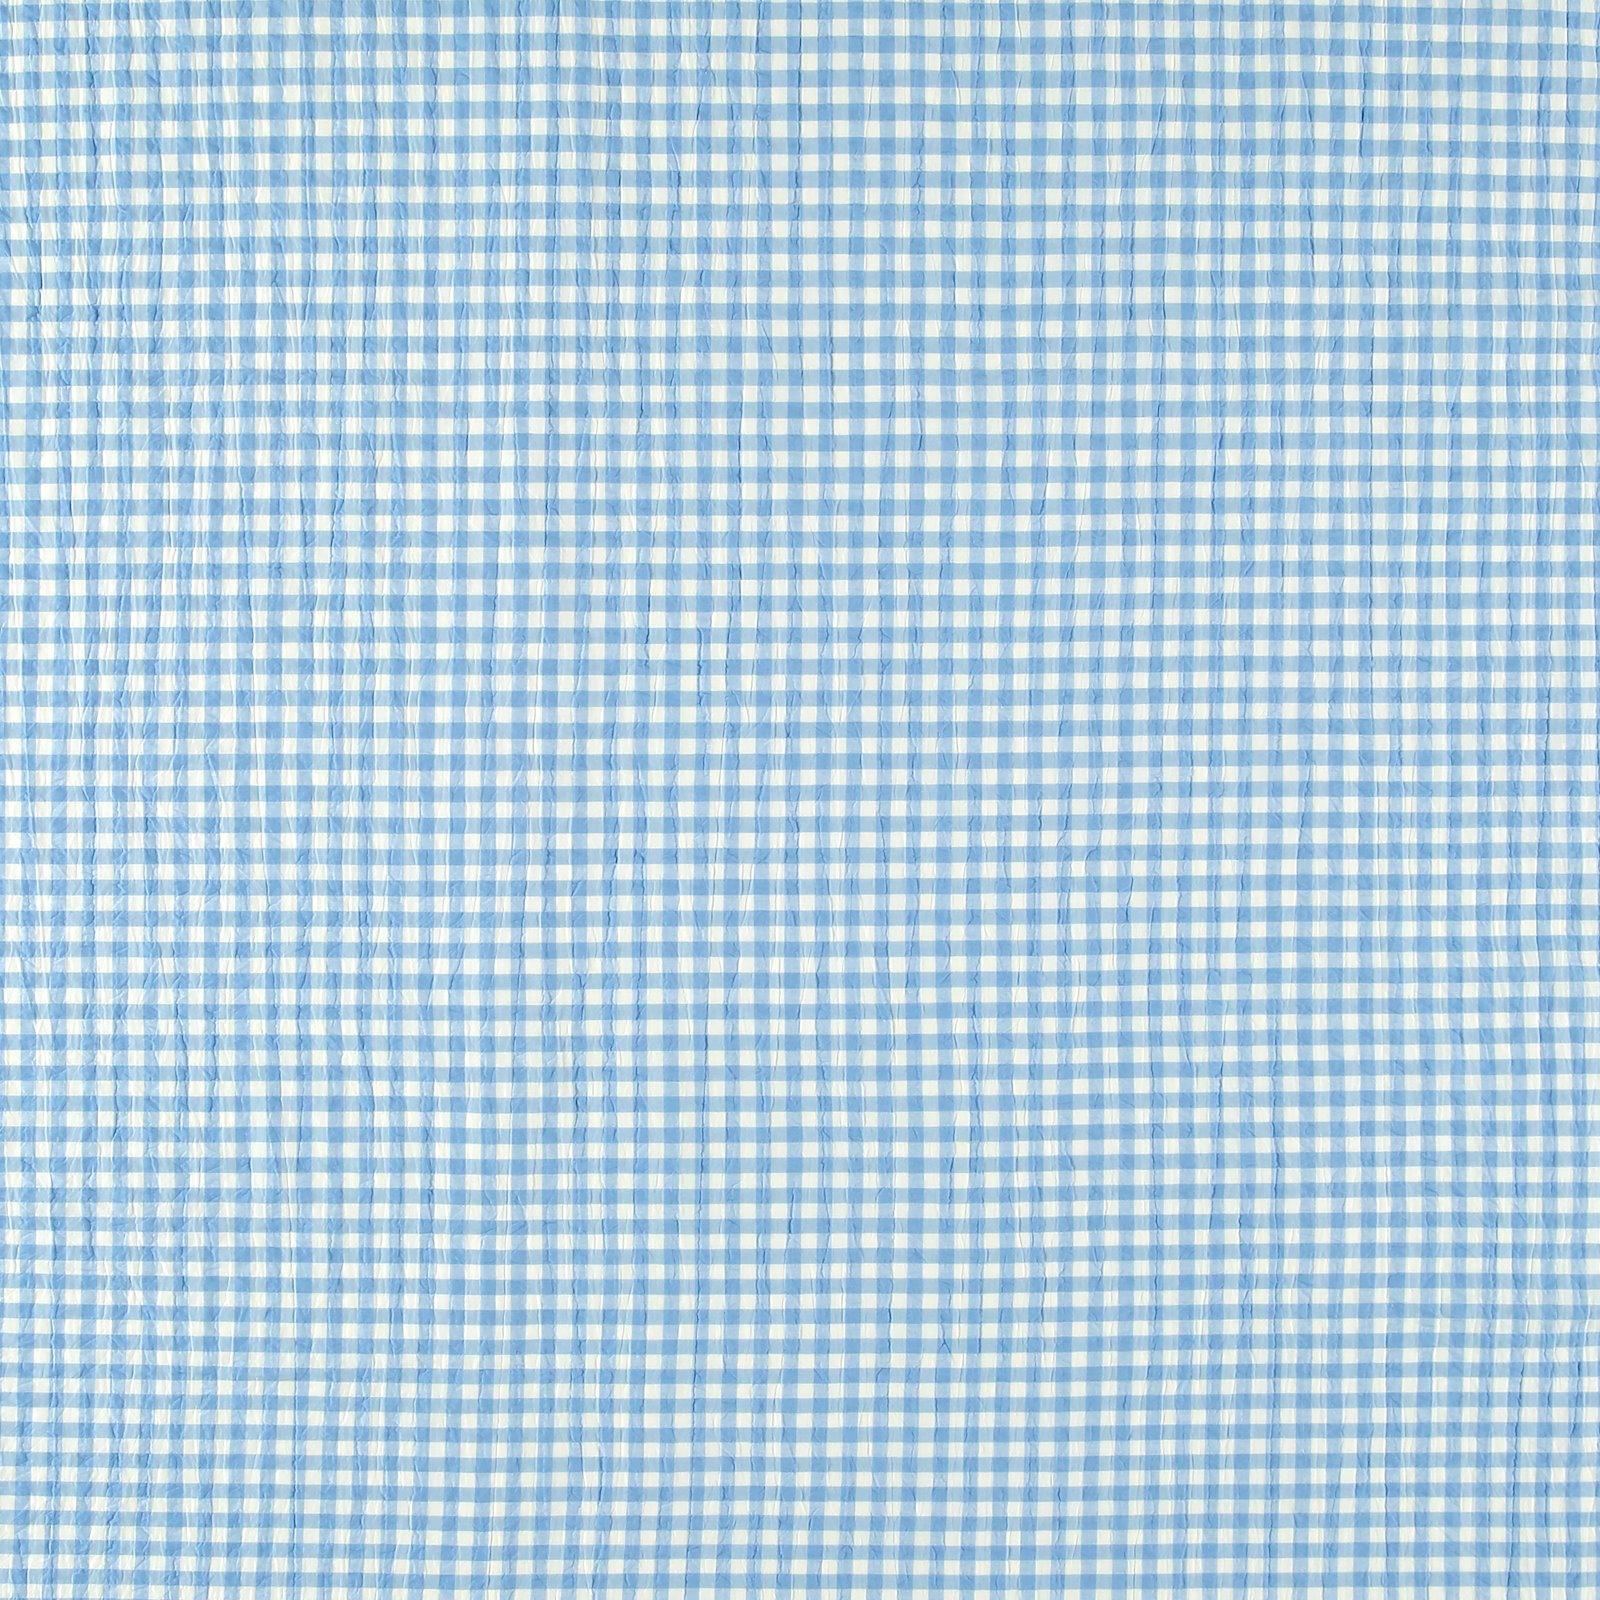 Seersucker light blue YD check 510967_pack_sp